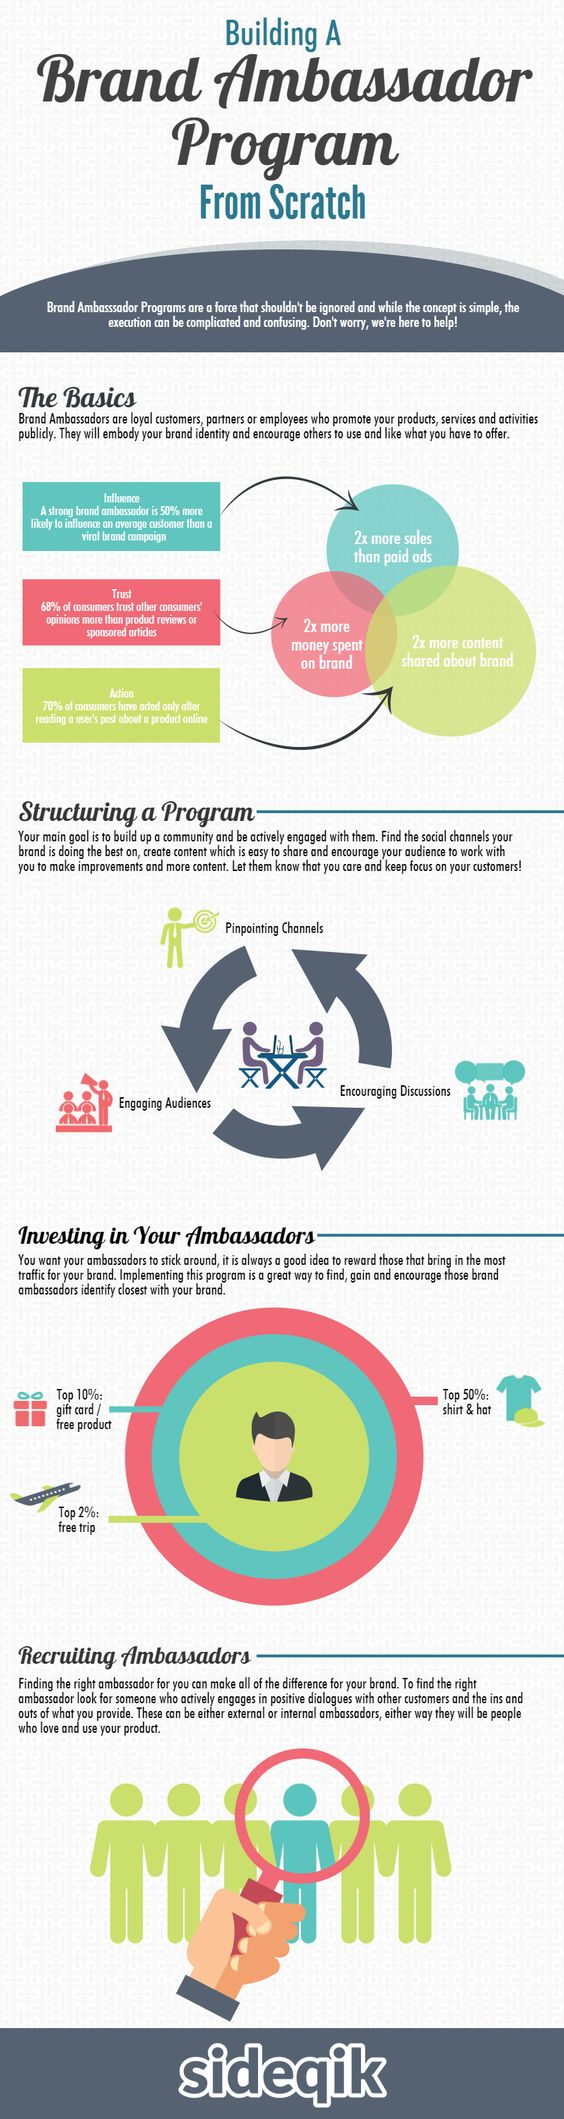 Building a Brand Ambassador Program From Scratch (Infographic)